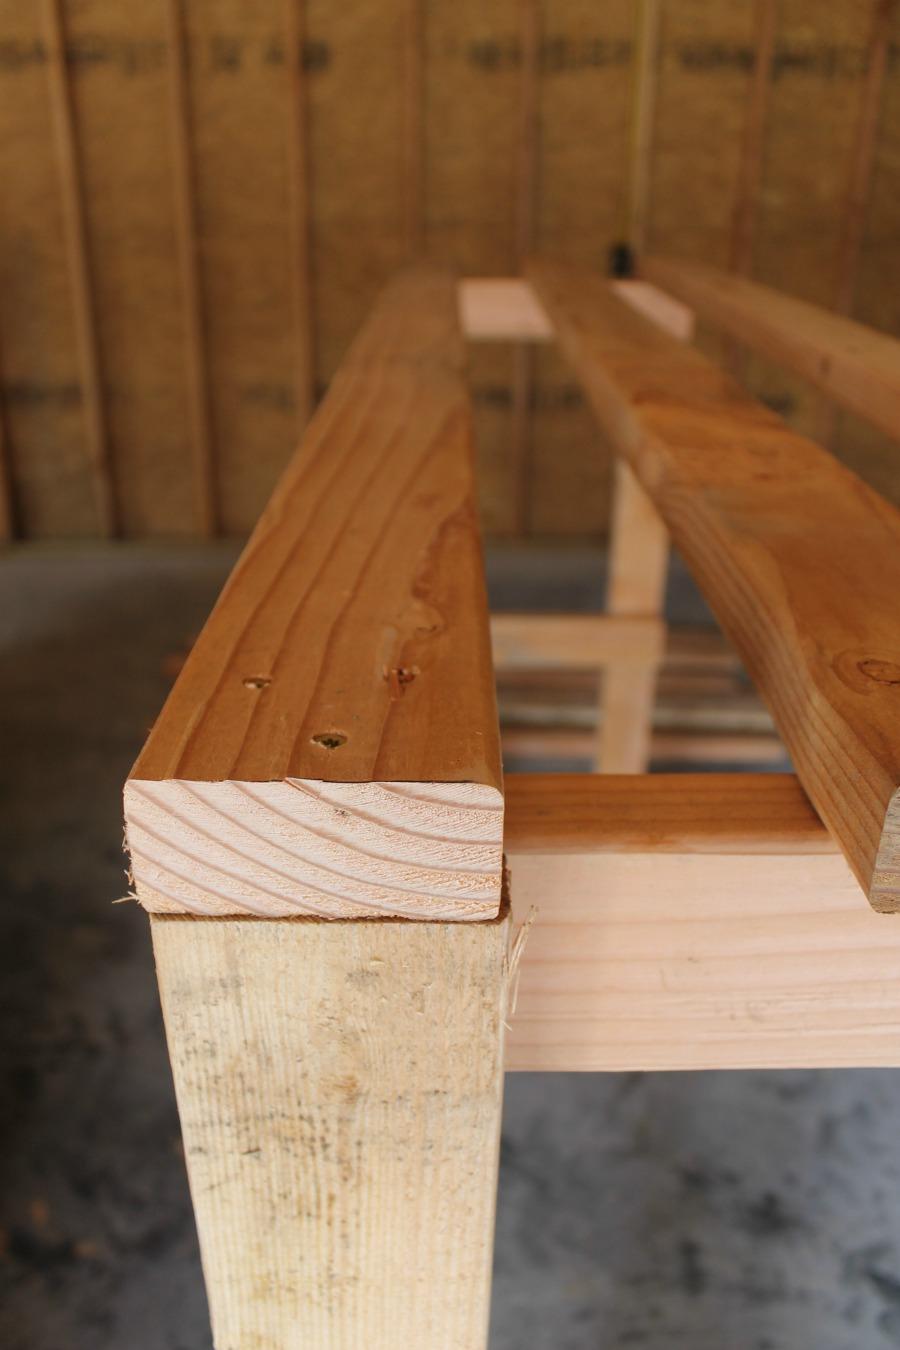 DIY Garage Storage Shelves - Add Top Shelf